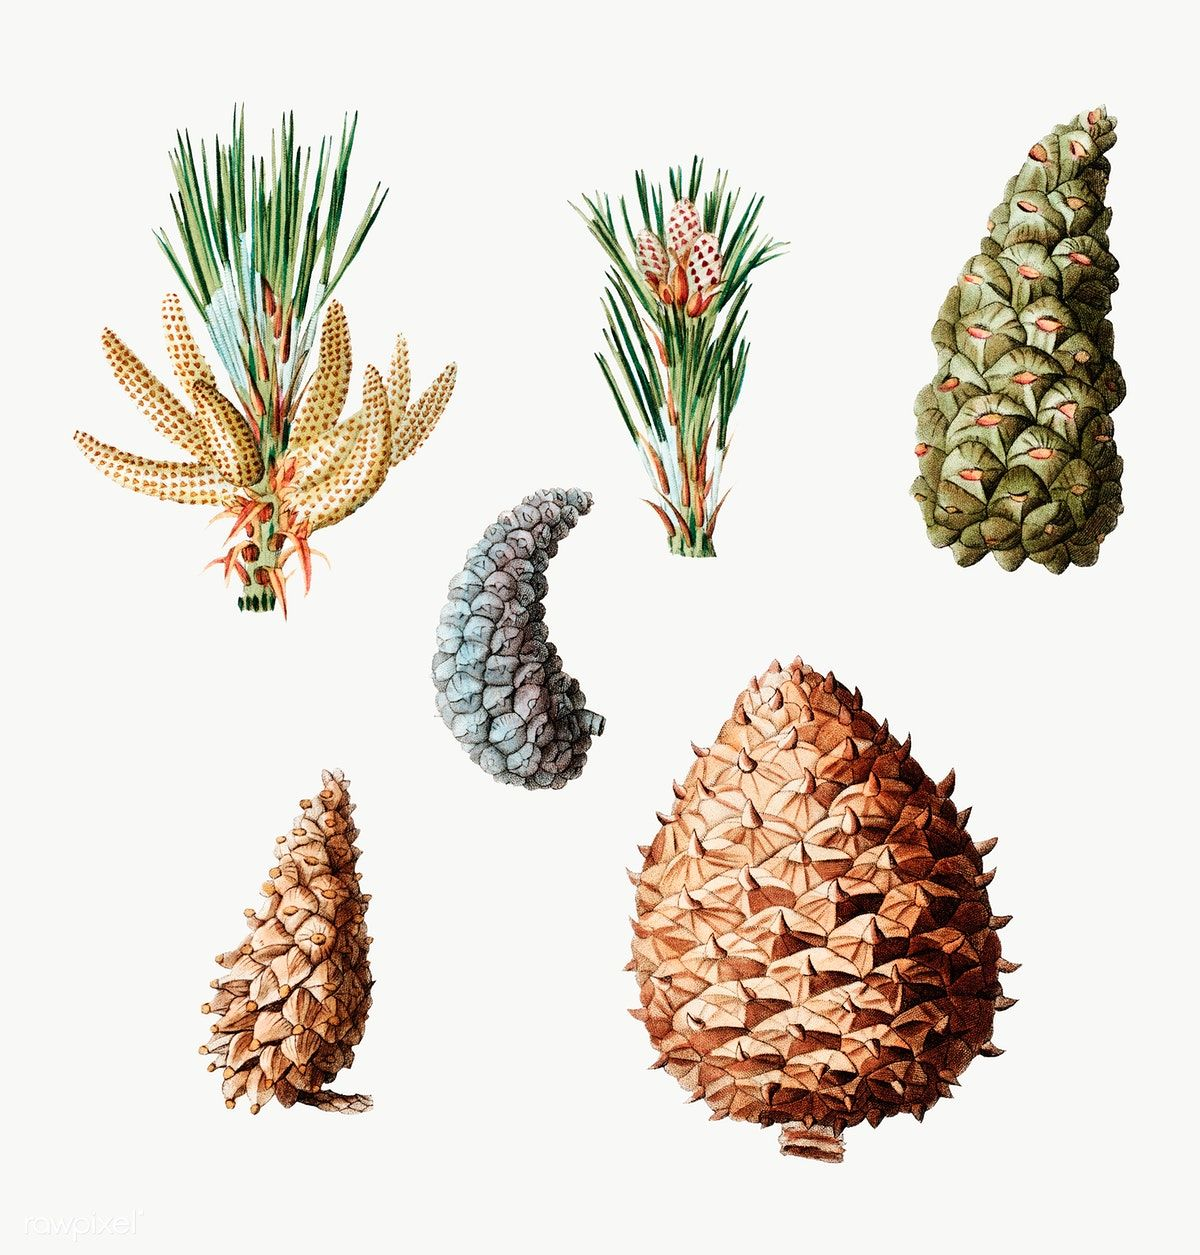 Pine Cone Png Image Pine Cones Cone Pine